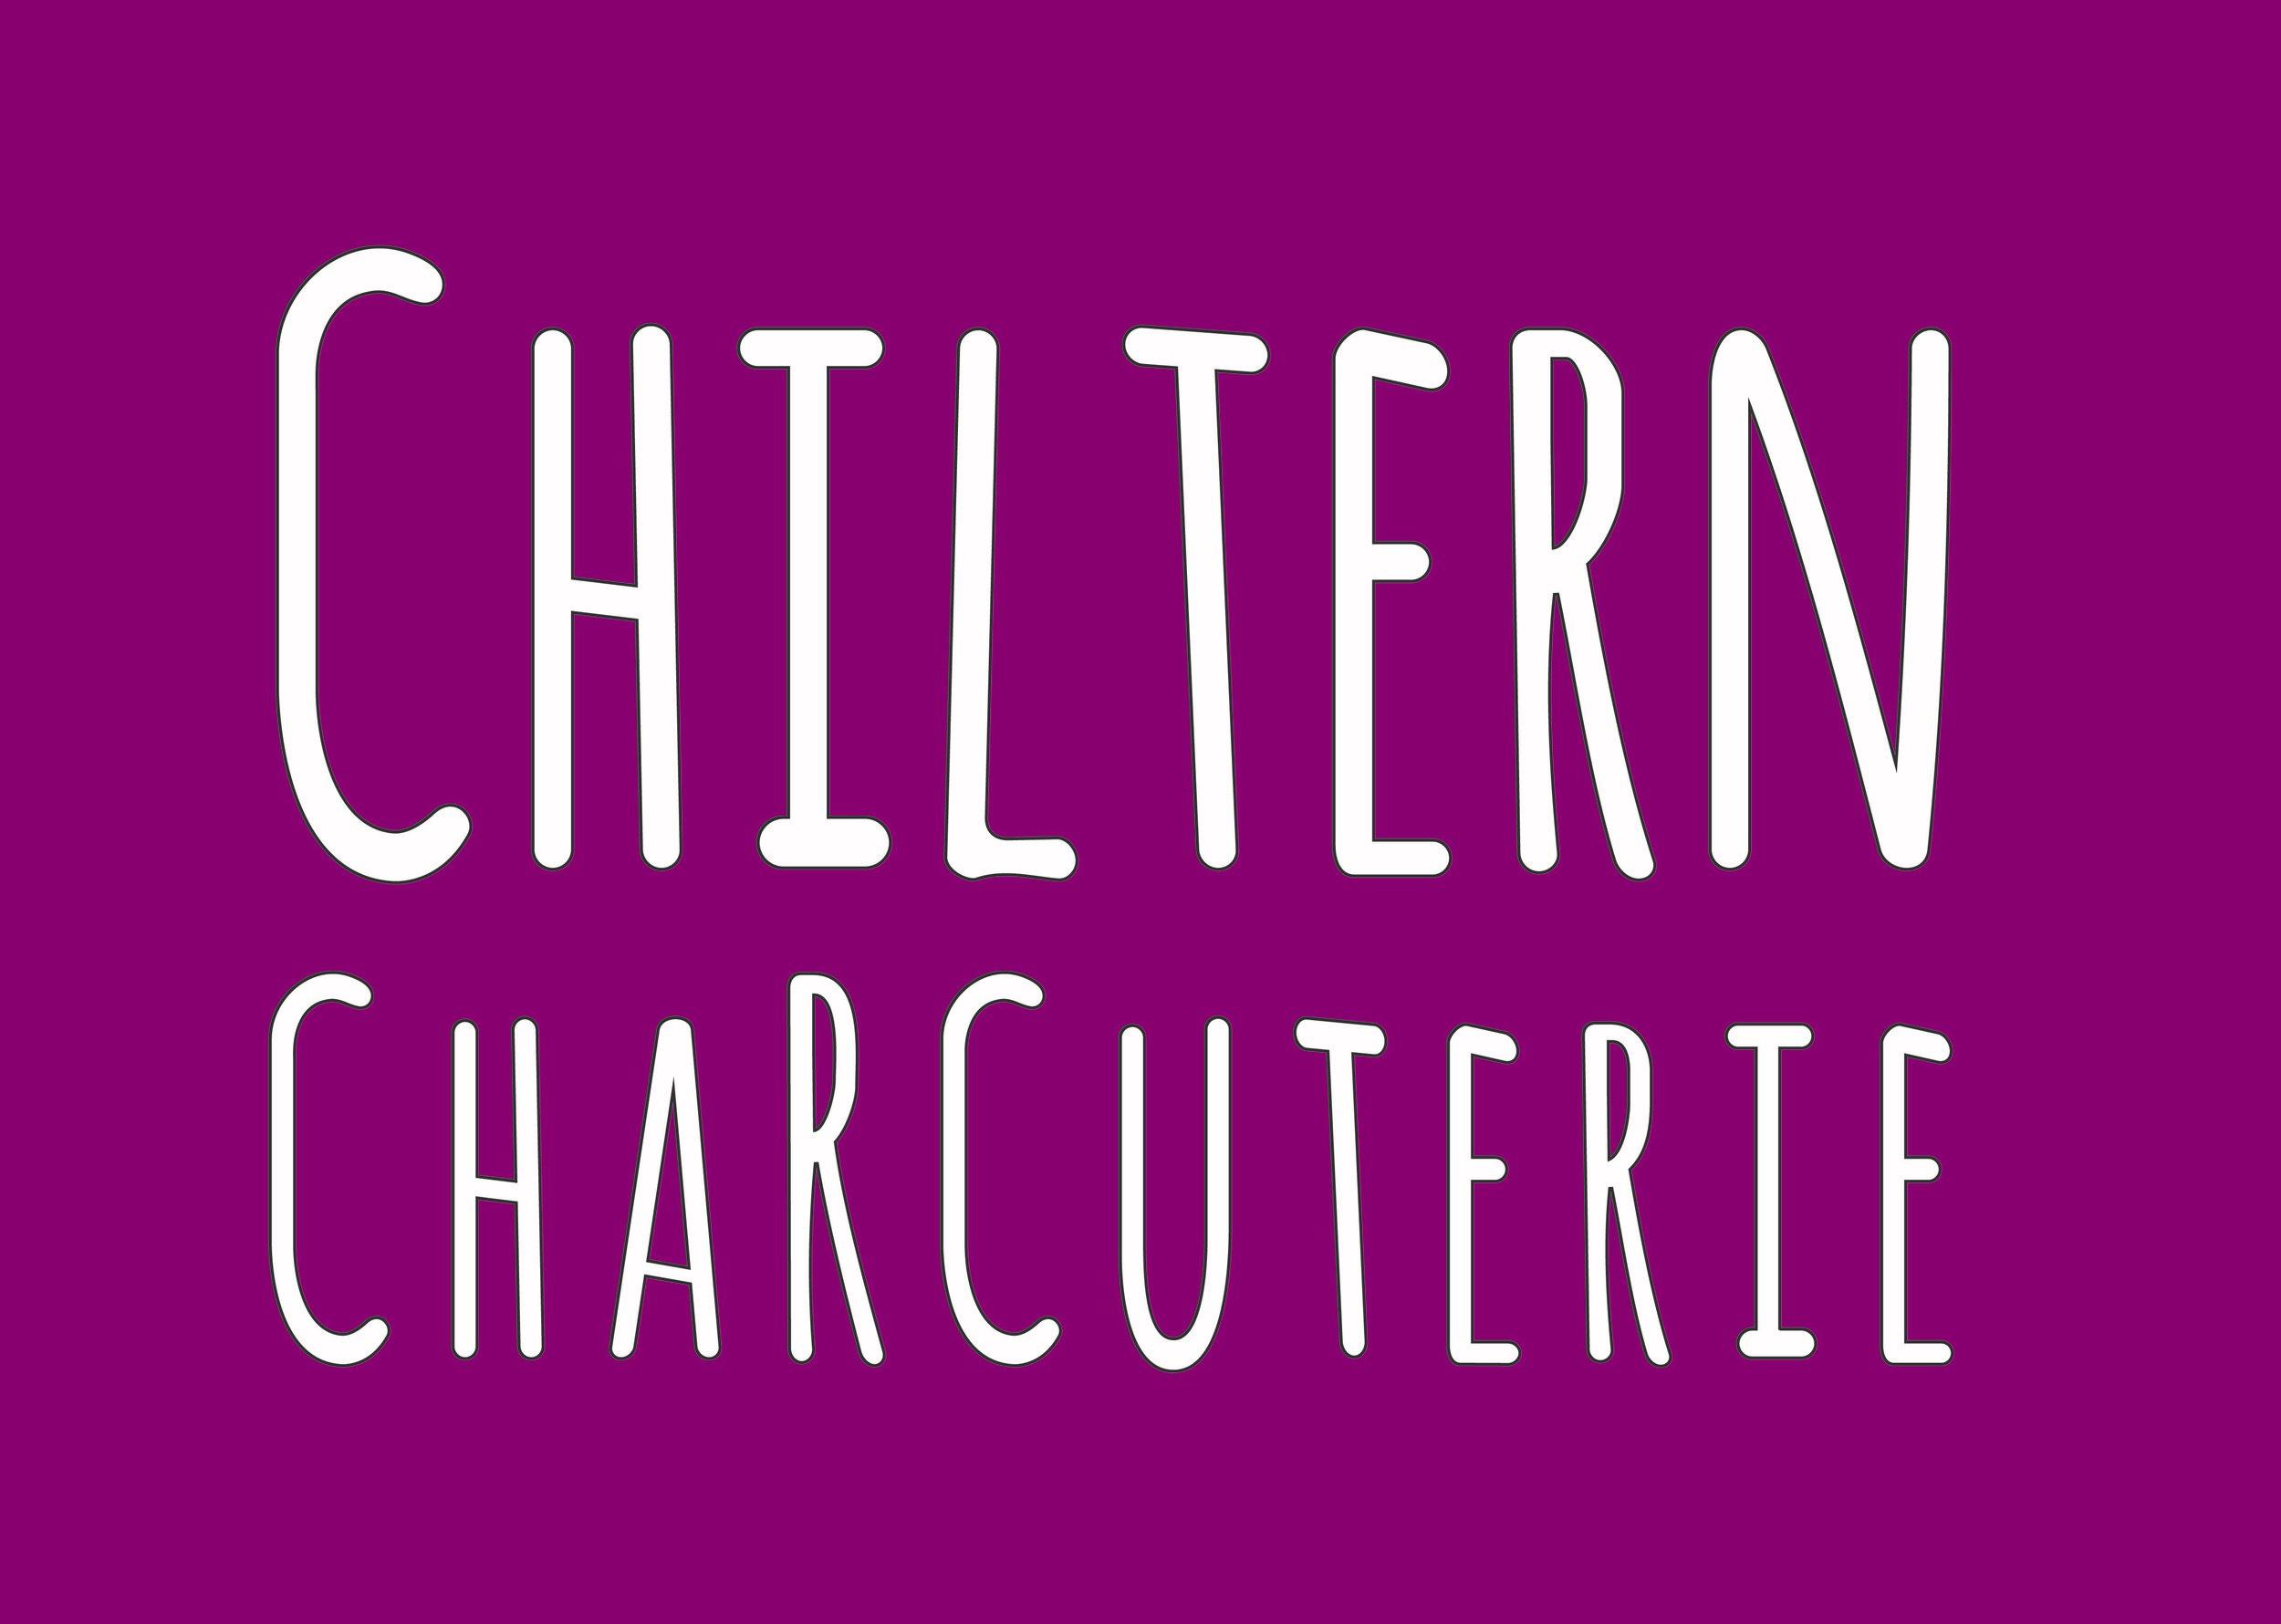 chiltern charcuterie.jpg